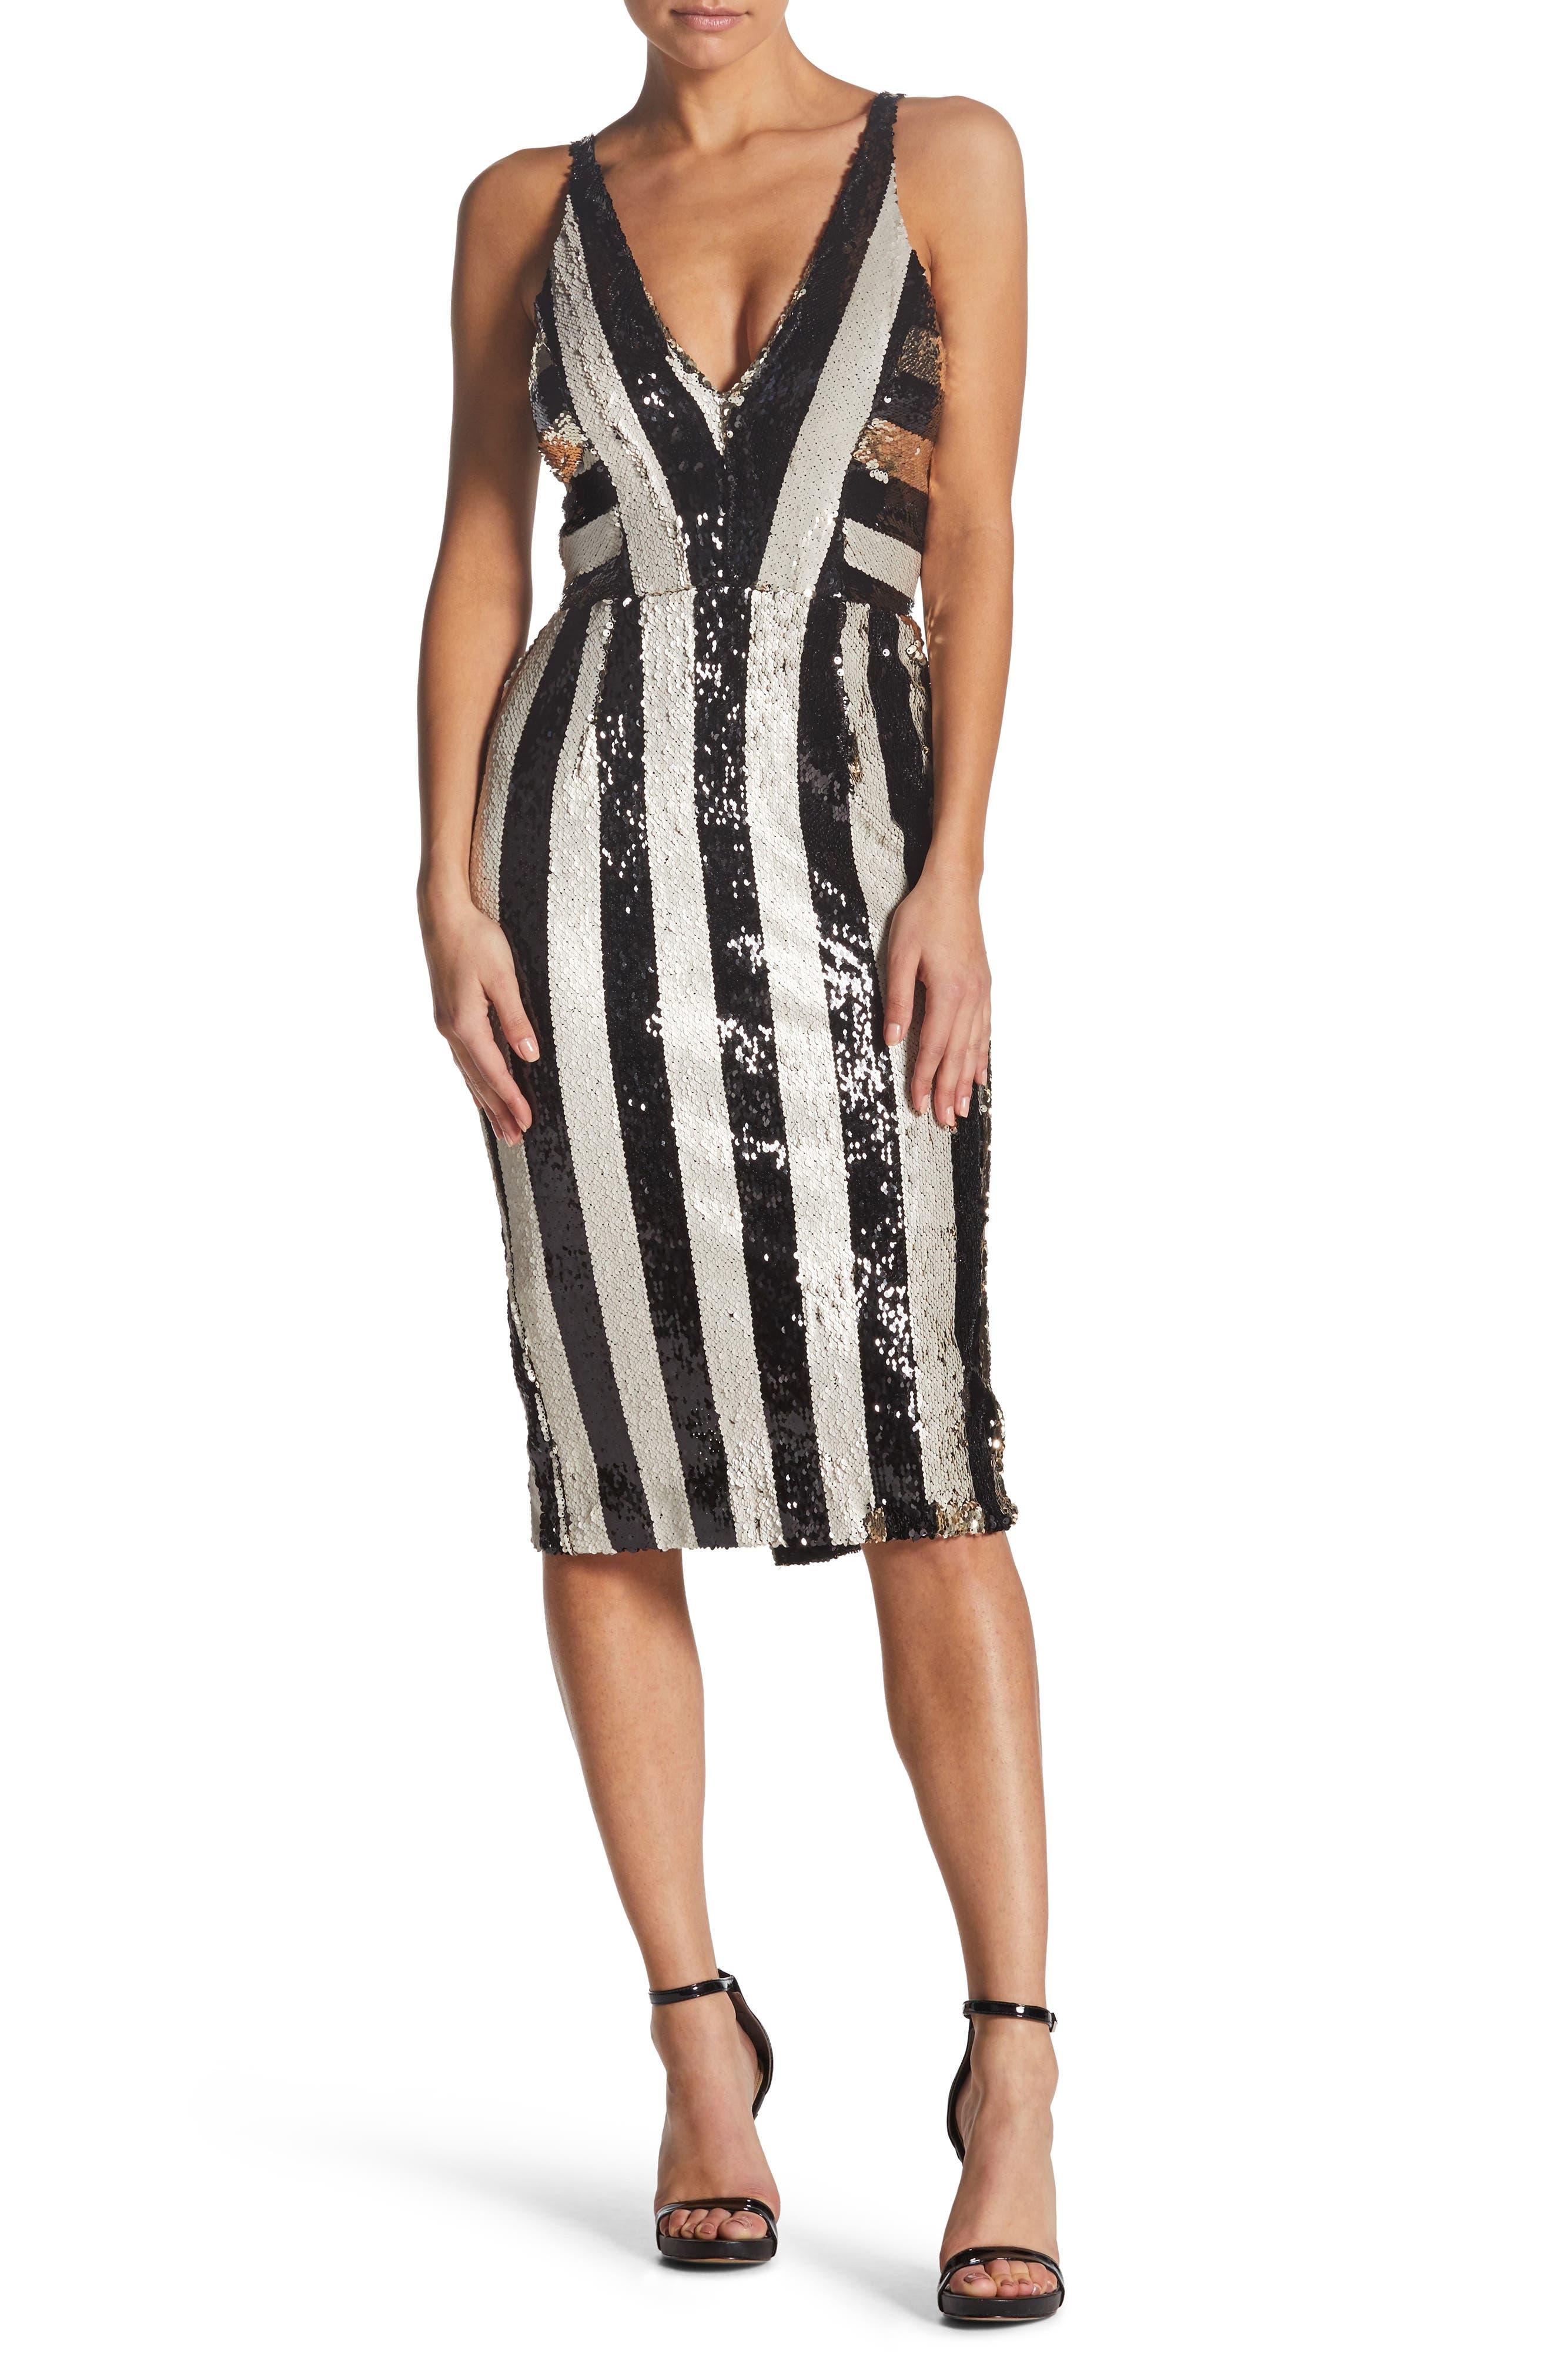 DRESS THE POPULATION Margo Sequin Striped V-Neck Dress in Black/ Bone